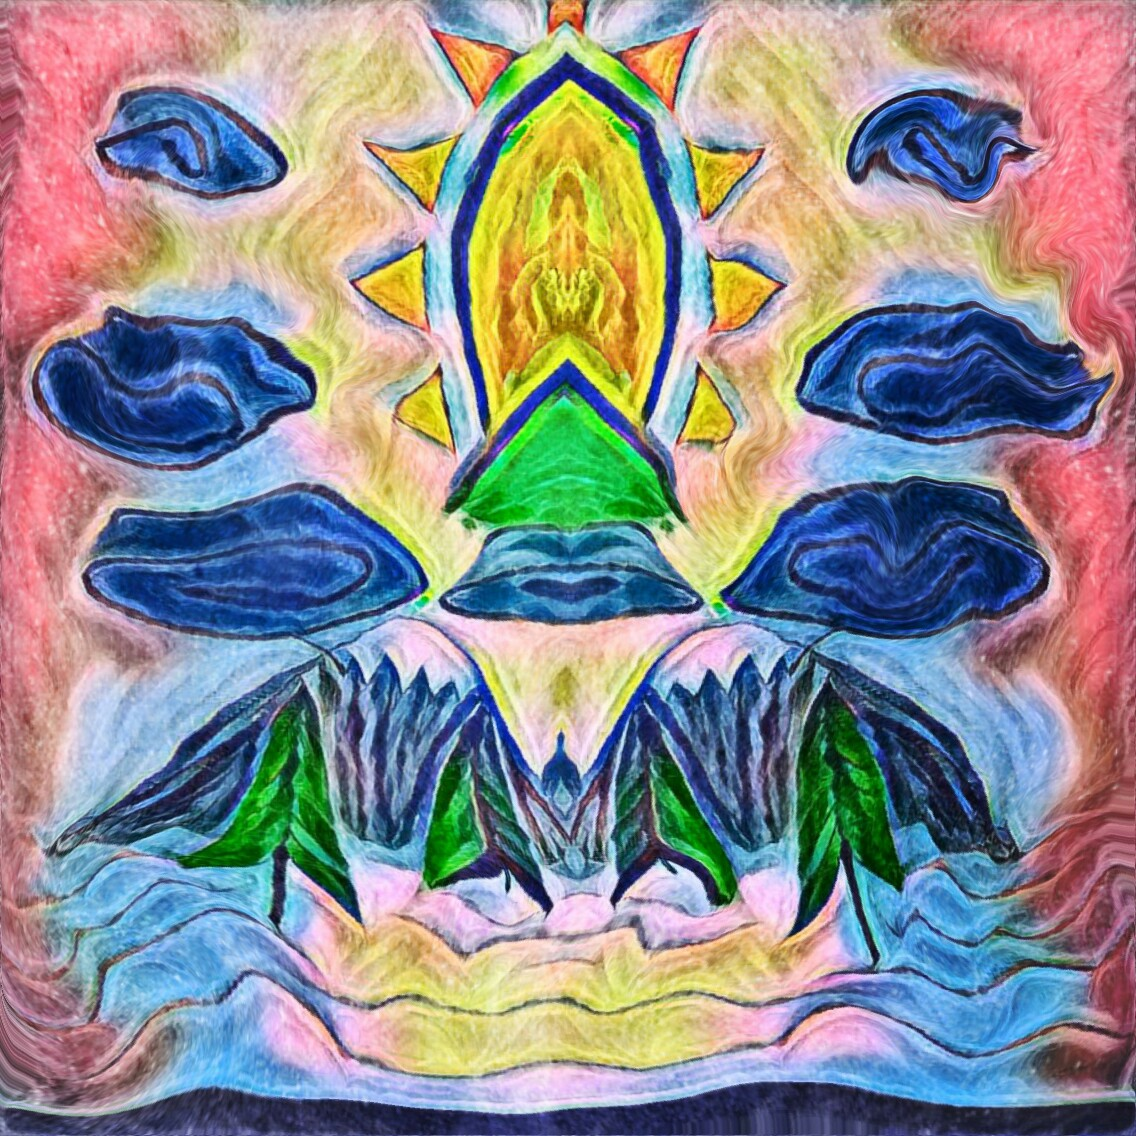 psychedelic art, trippy art, strange art, sun, spiritual art, god, surreal art, jesus, messiah, vagina, trees, mountain, clouds